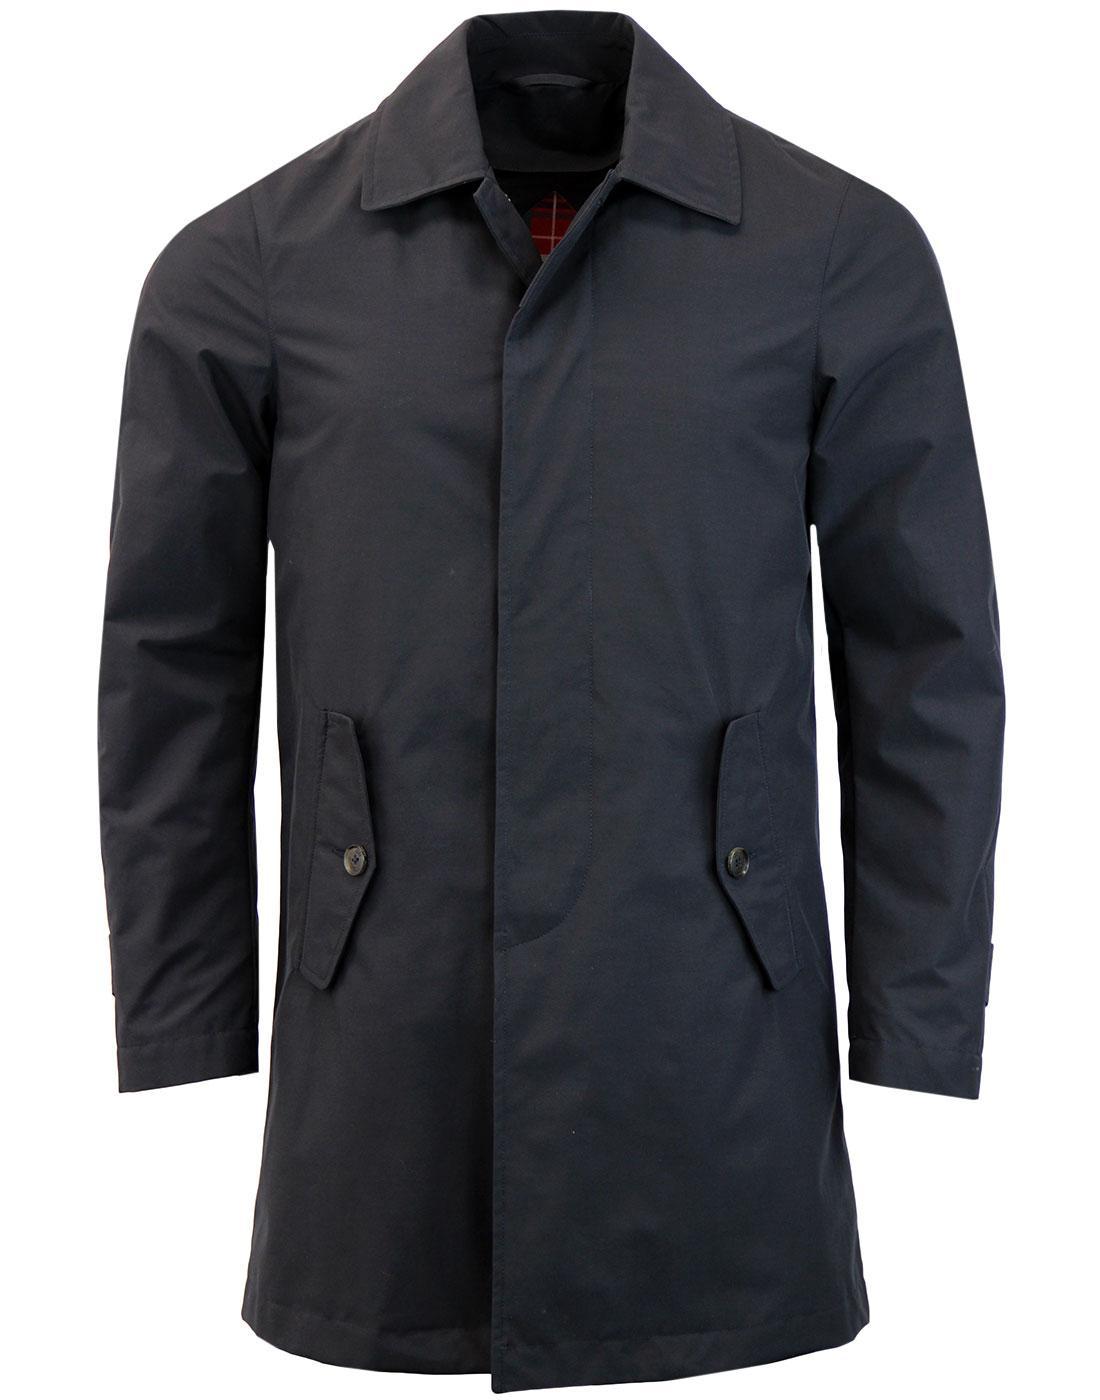 BARACUTA G10 Detachable Quilted Liner Mac Coat (N)